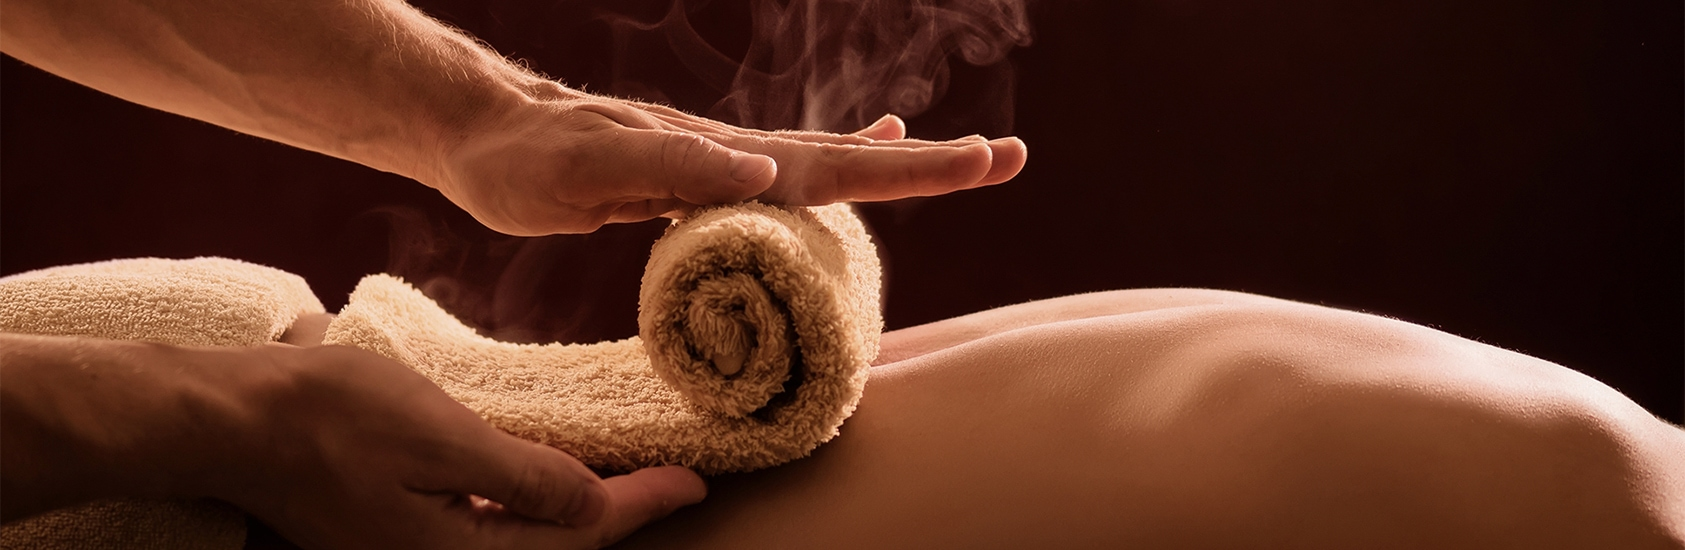 Massage médical Tui Na en Médecine Traditionnelle Chinoise